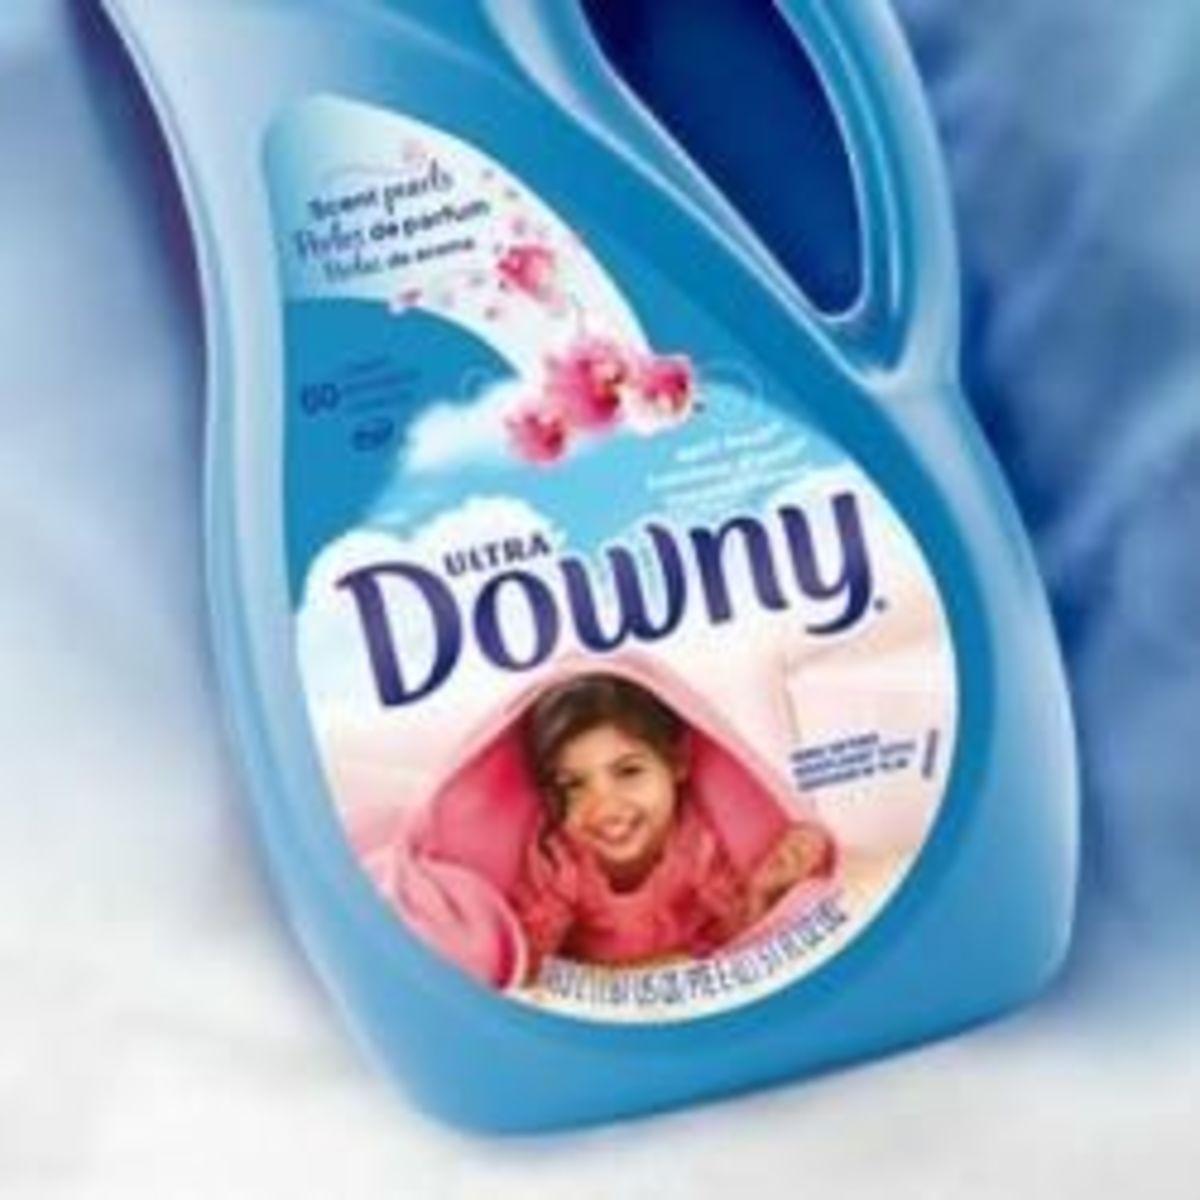 downy-or-comfort-fabric-softener